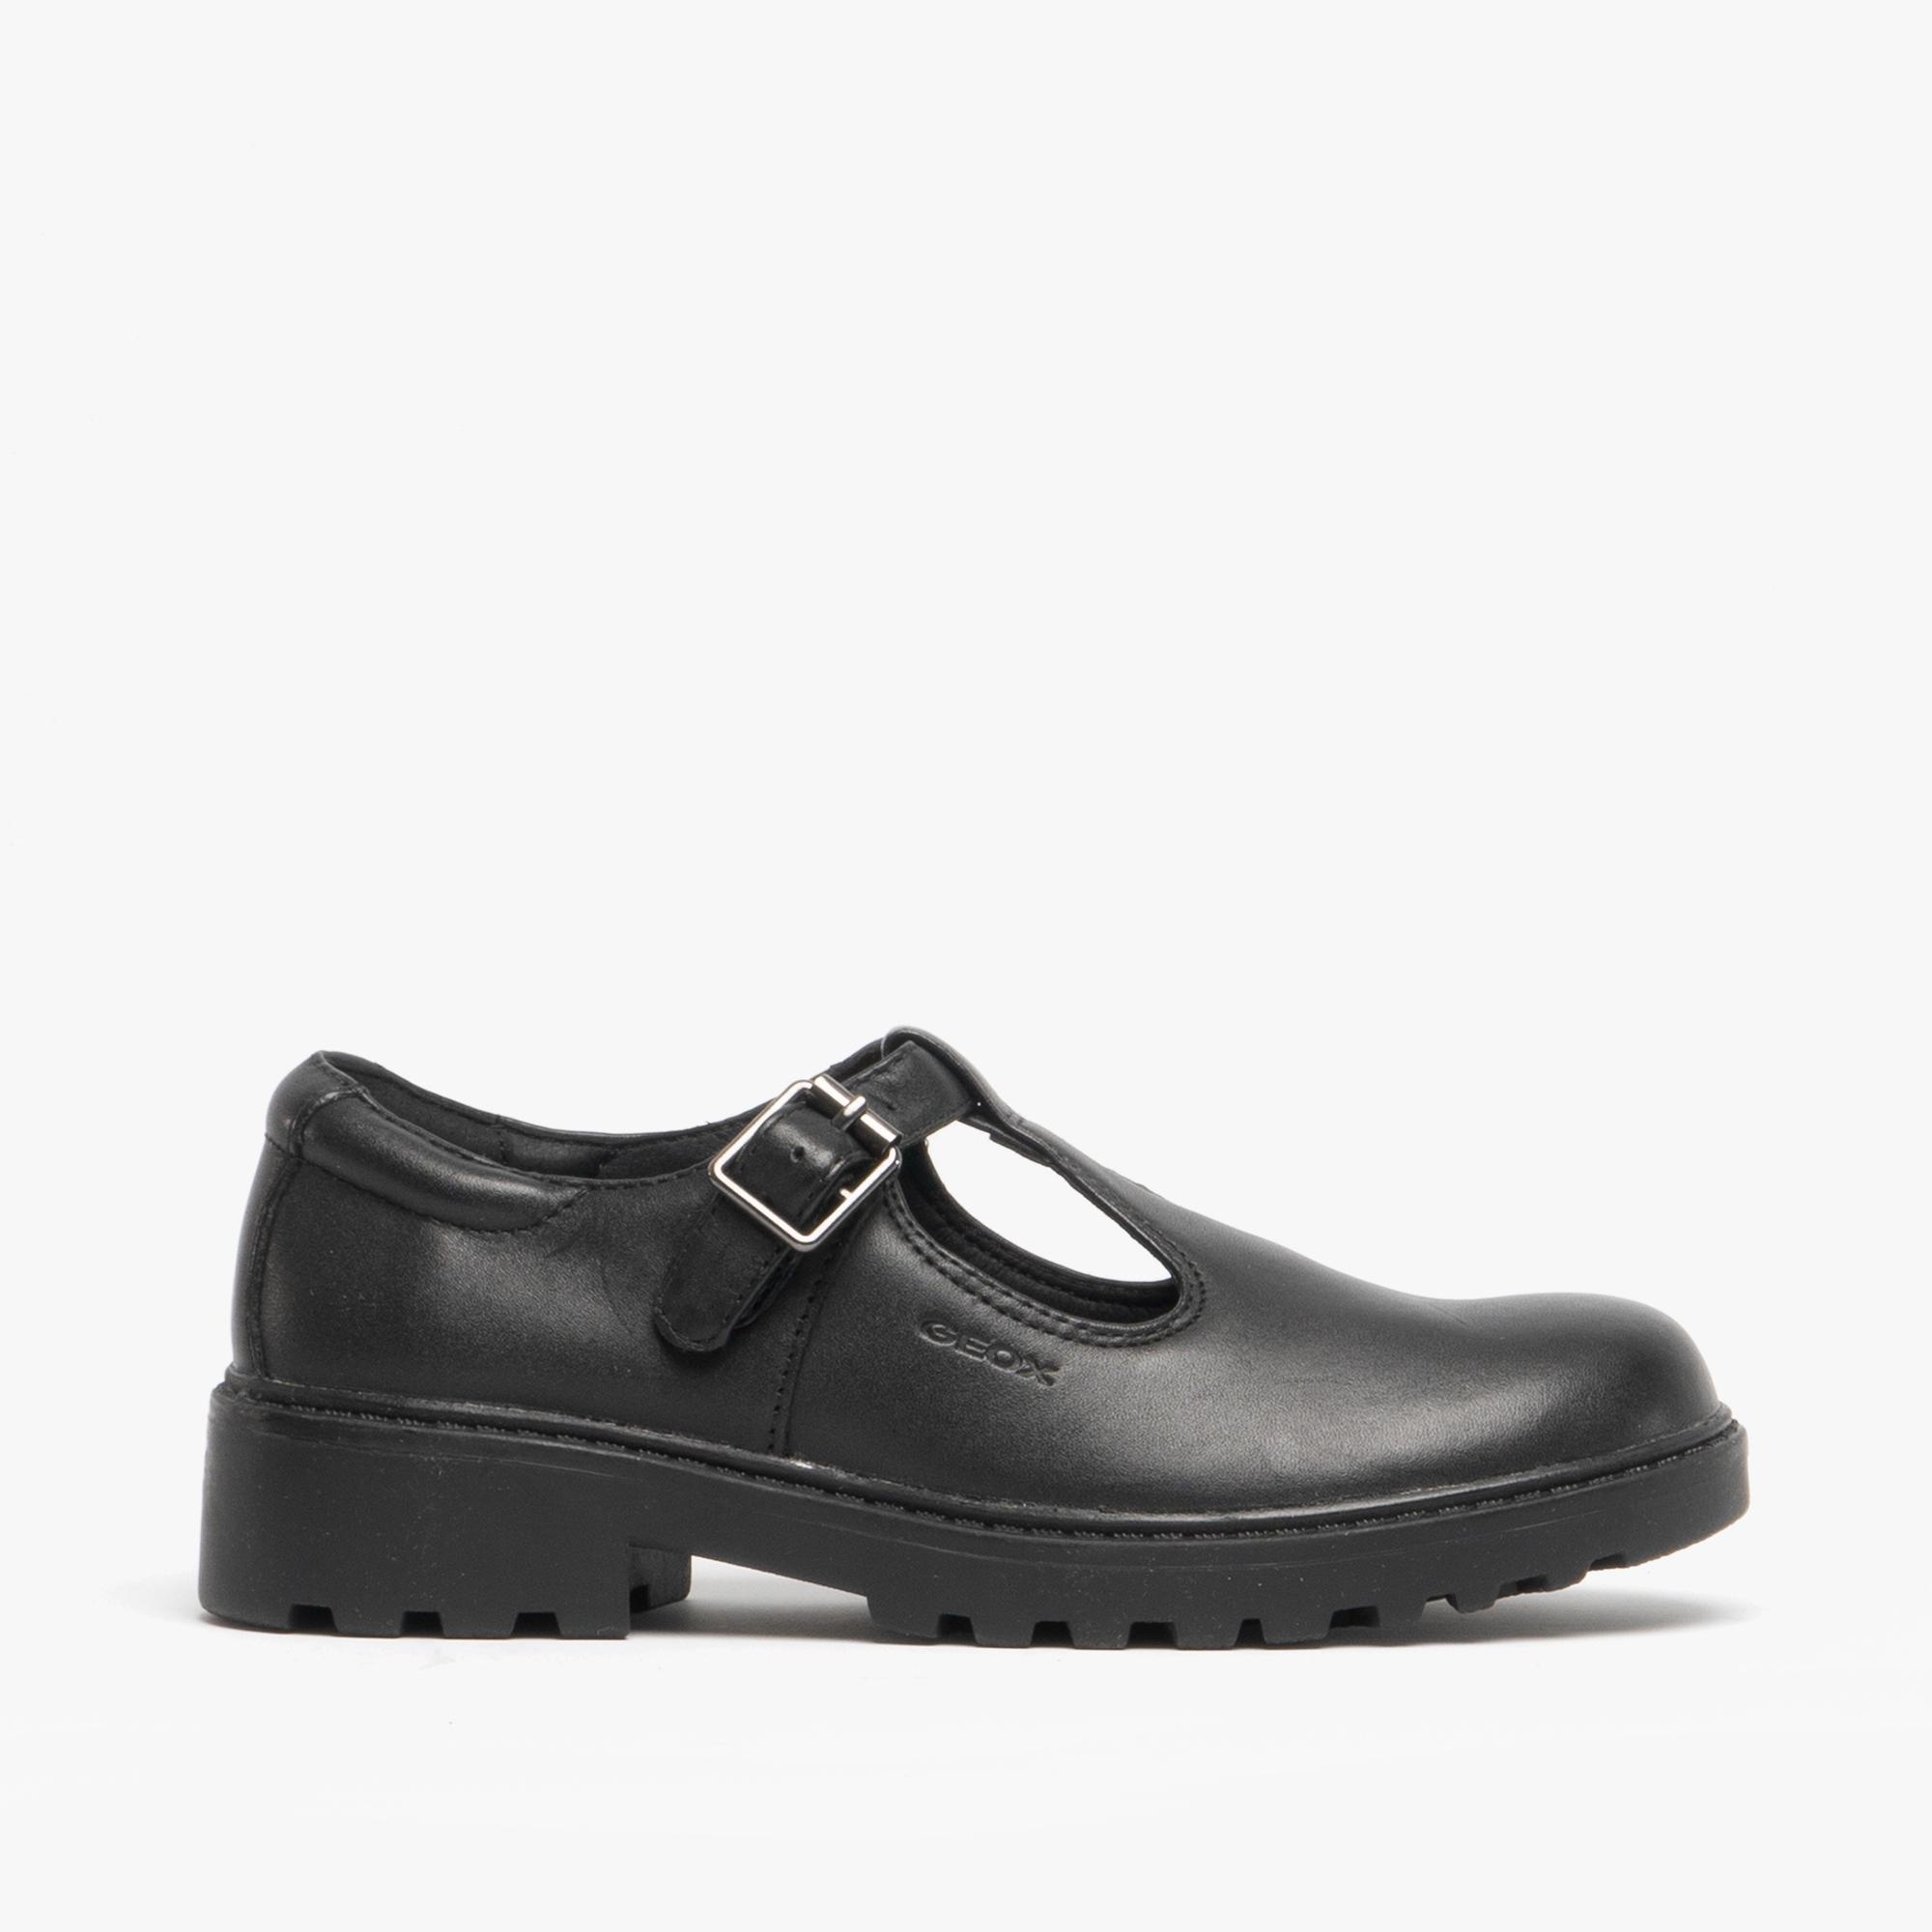 Geox School Shoes at SchoolShoes.co.uk